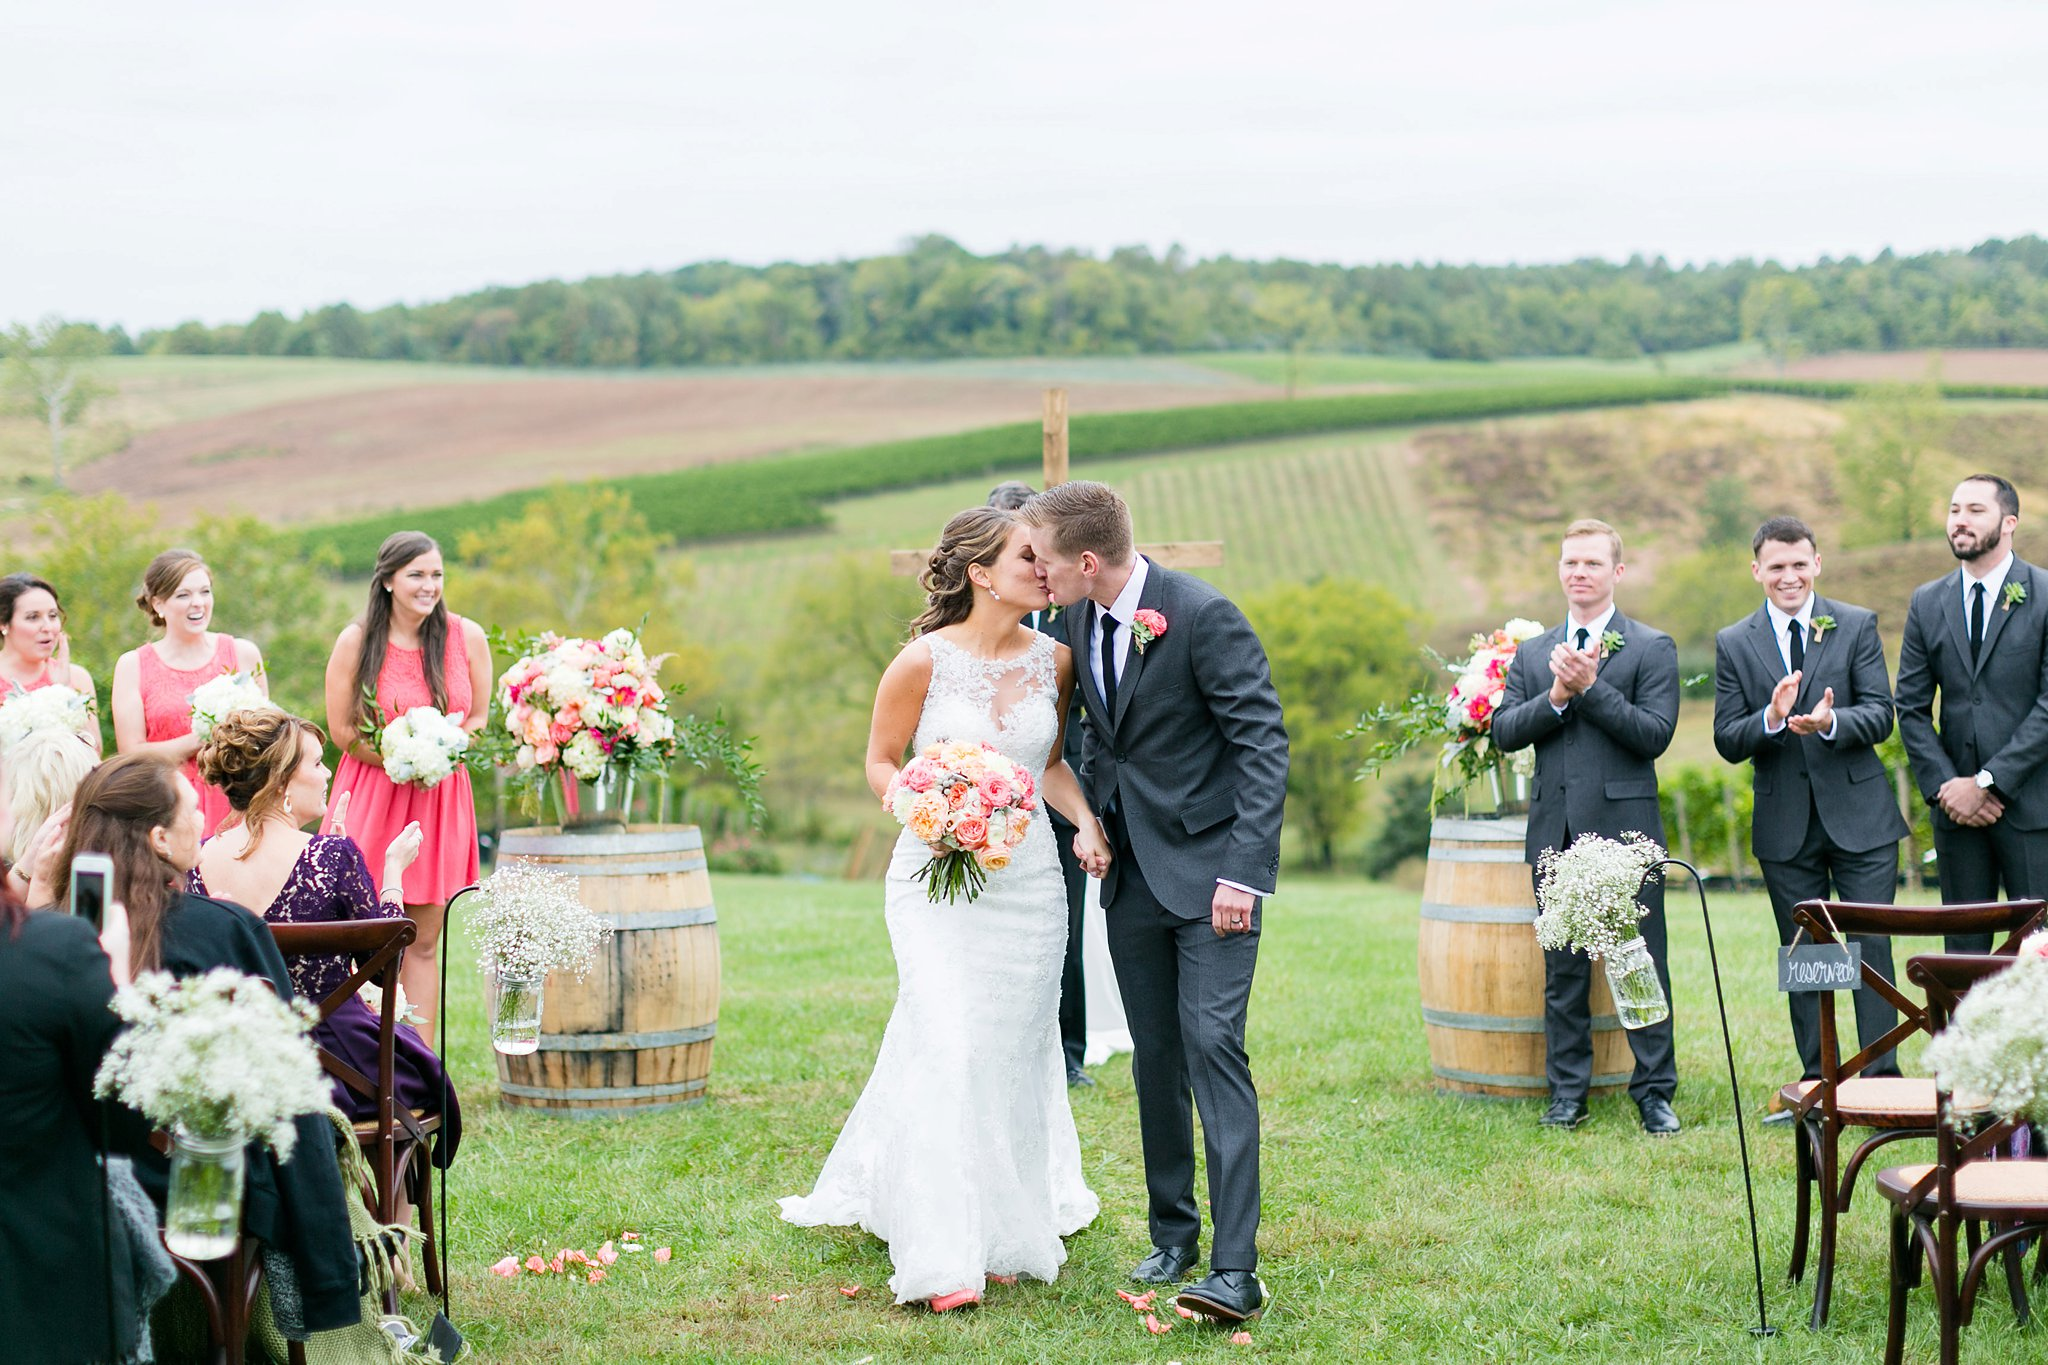 Stone Tower Winery Wedding Photos Virginia Wedding Photographer Megan Kelsey Photography Sam & Angela-167.jpg